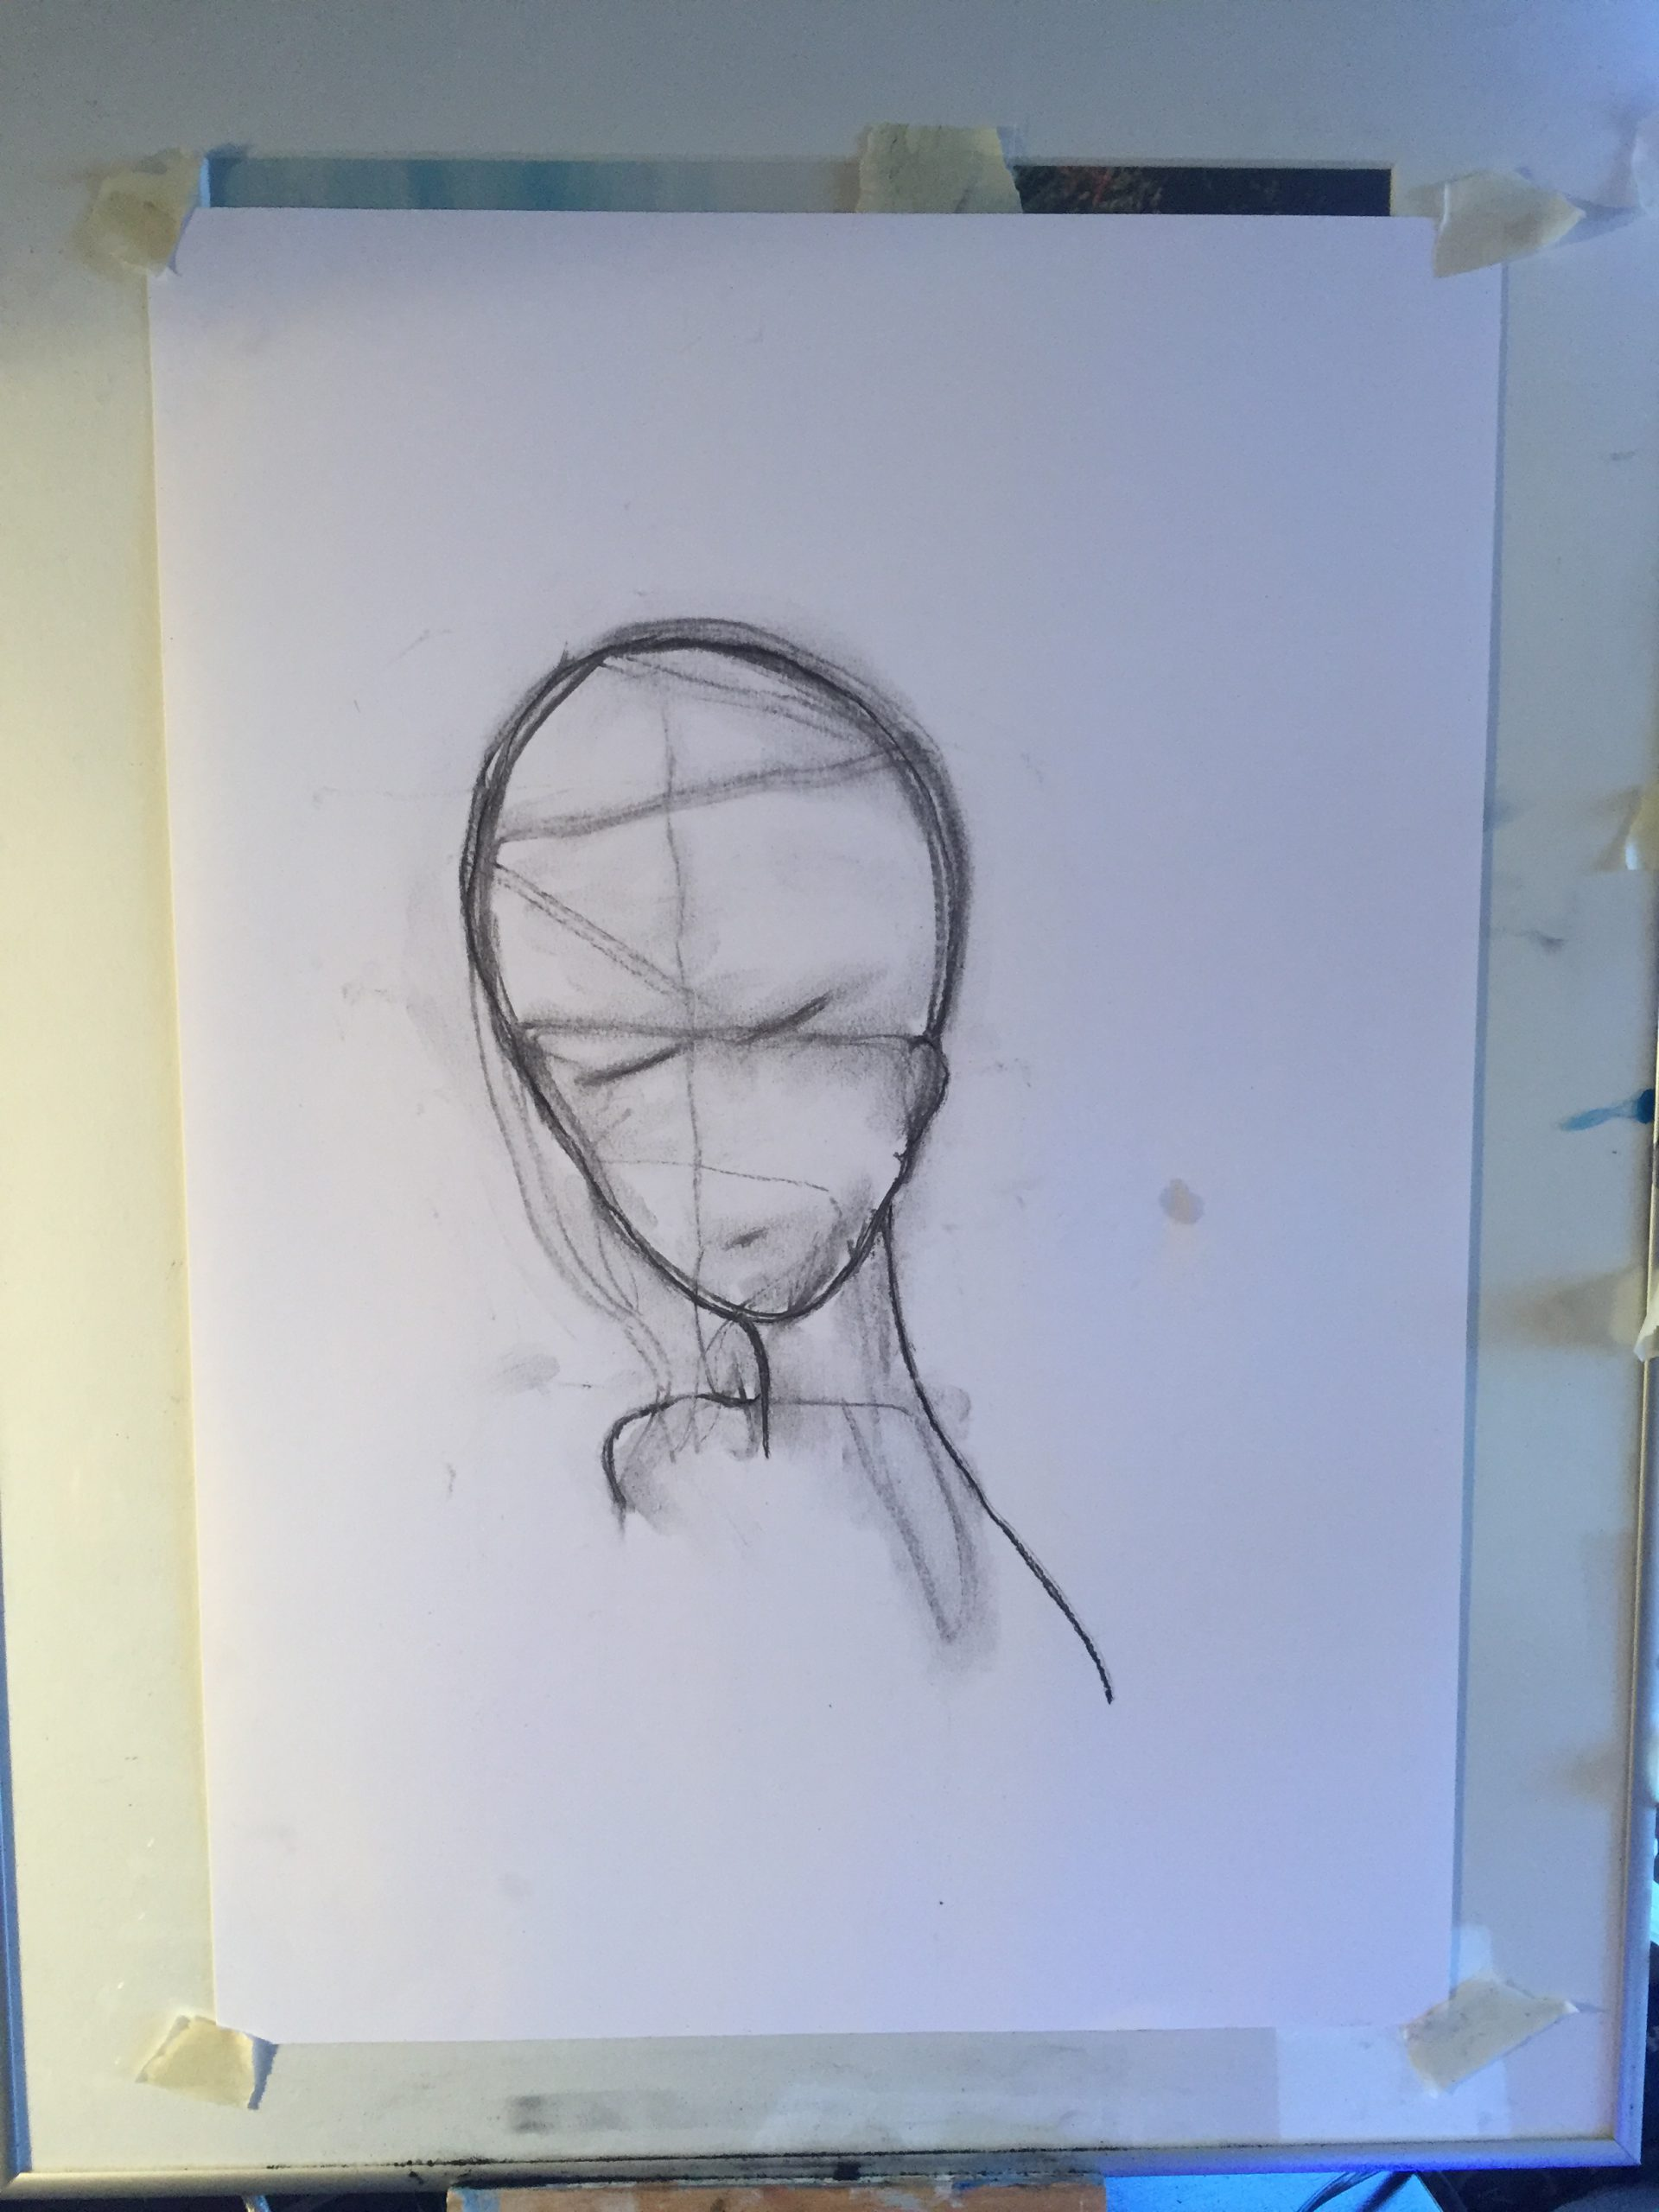 We must be kind. Original artwork drawing in charcoal.